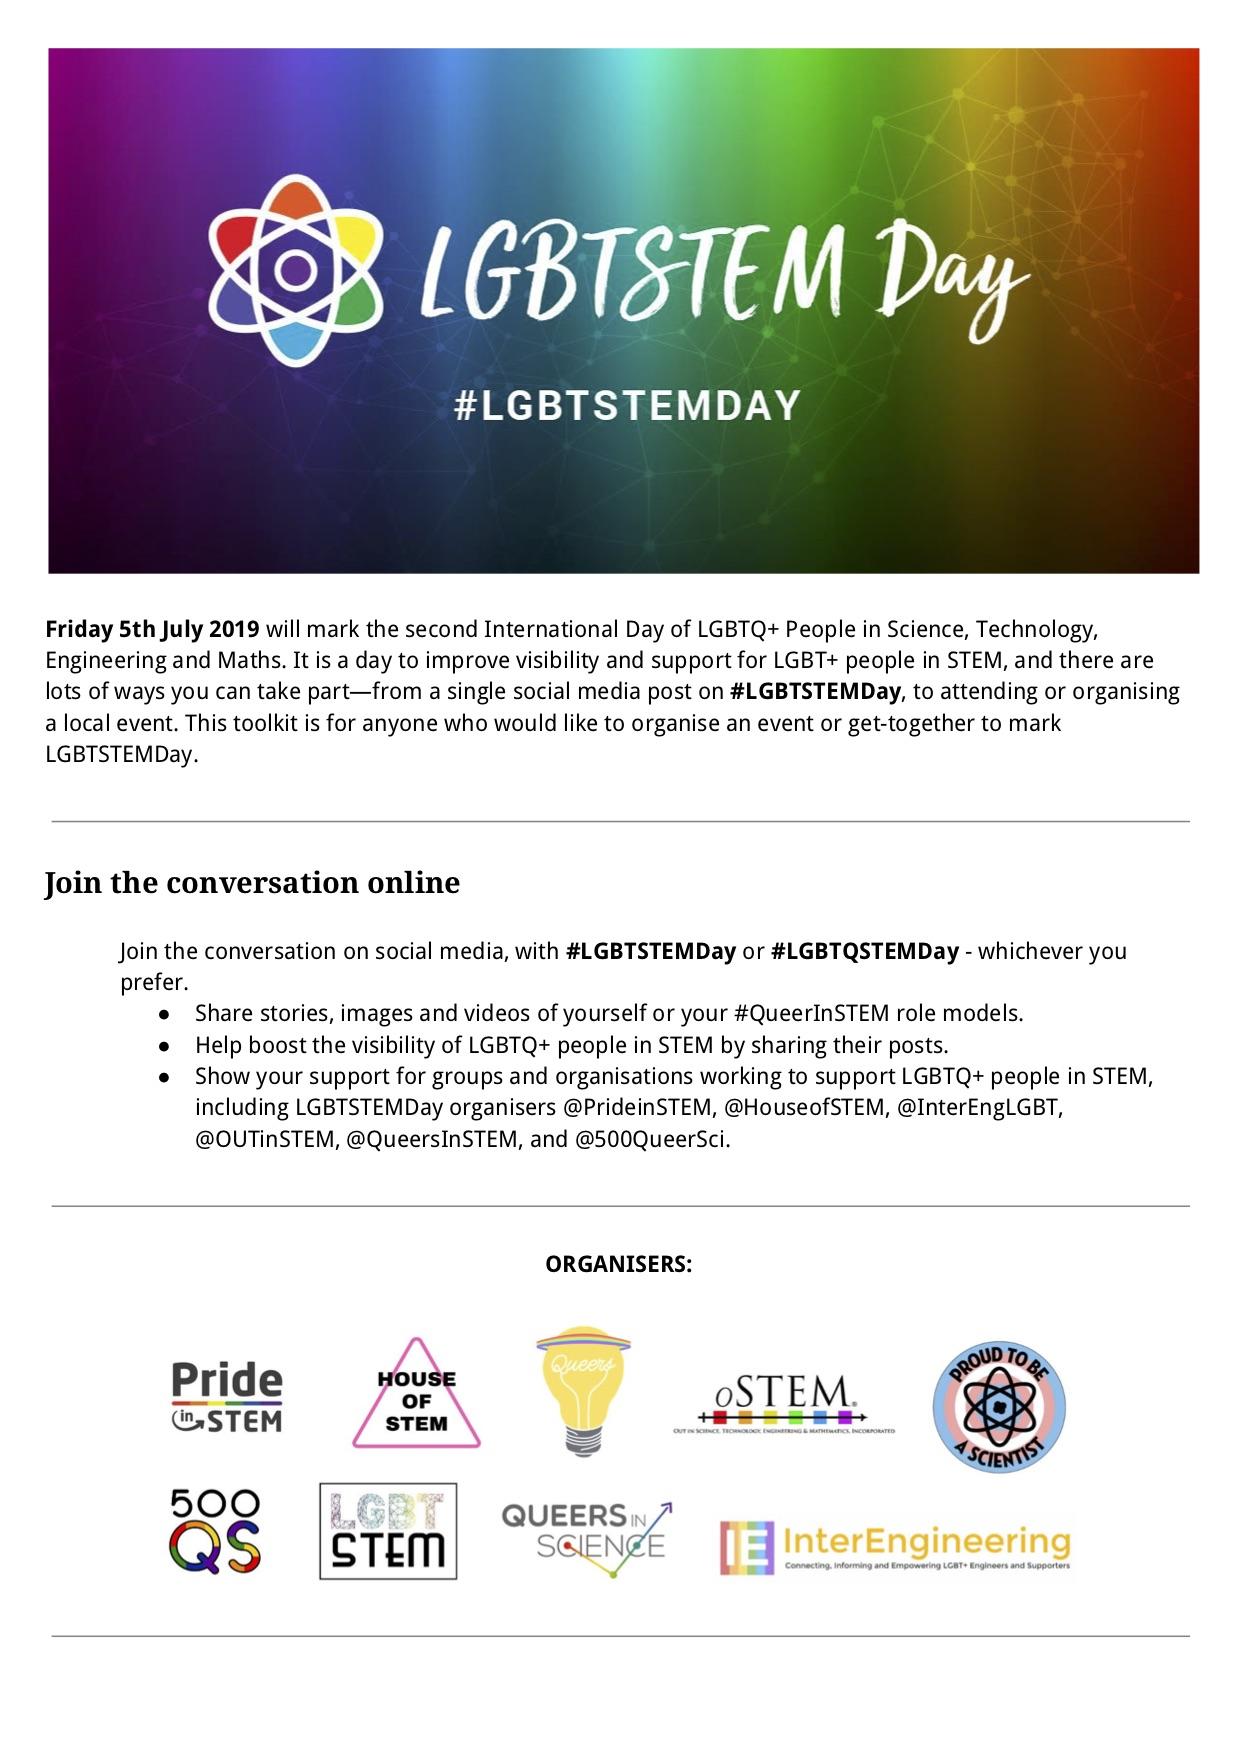 LGBTSTEMDay_2019_Toolkit_May31.jpg